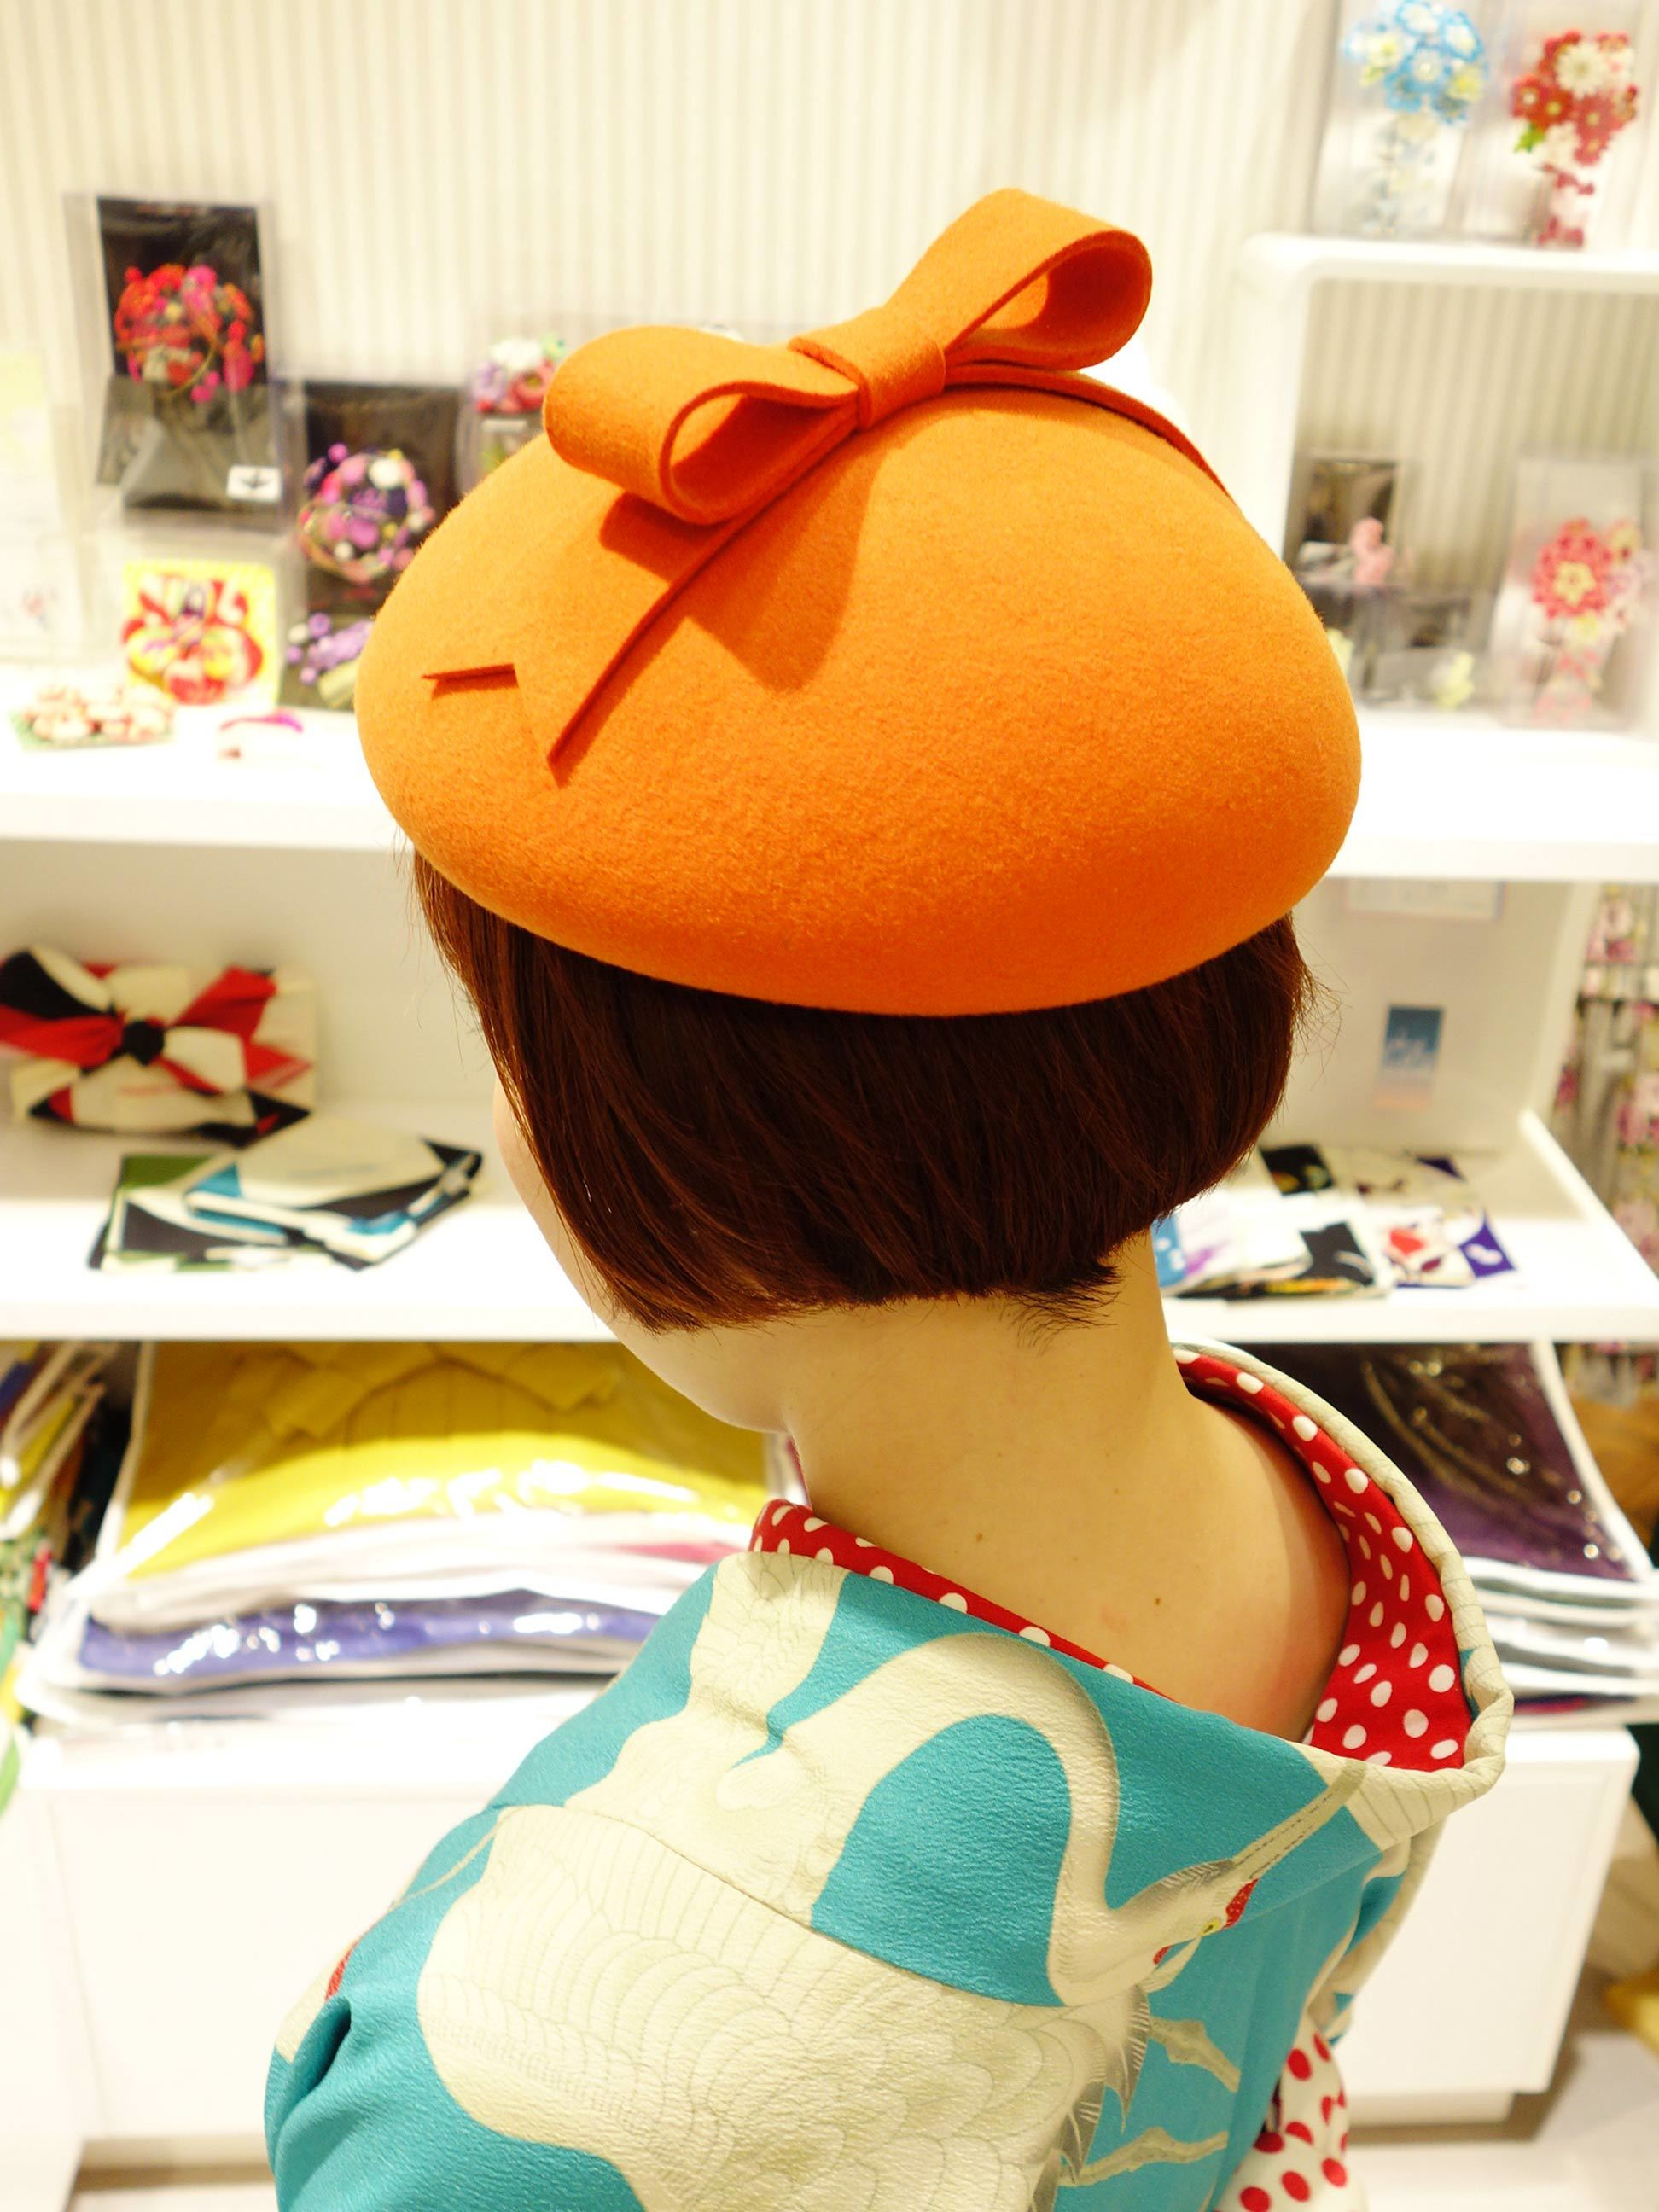 Chapon新作帽子*入荷です!_e0167832_20542498.jpg